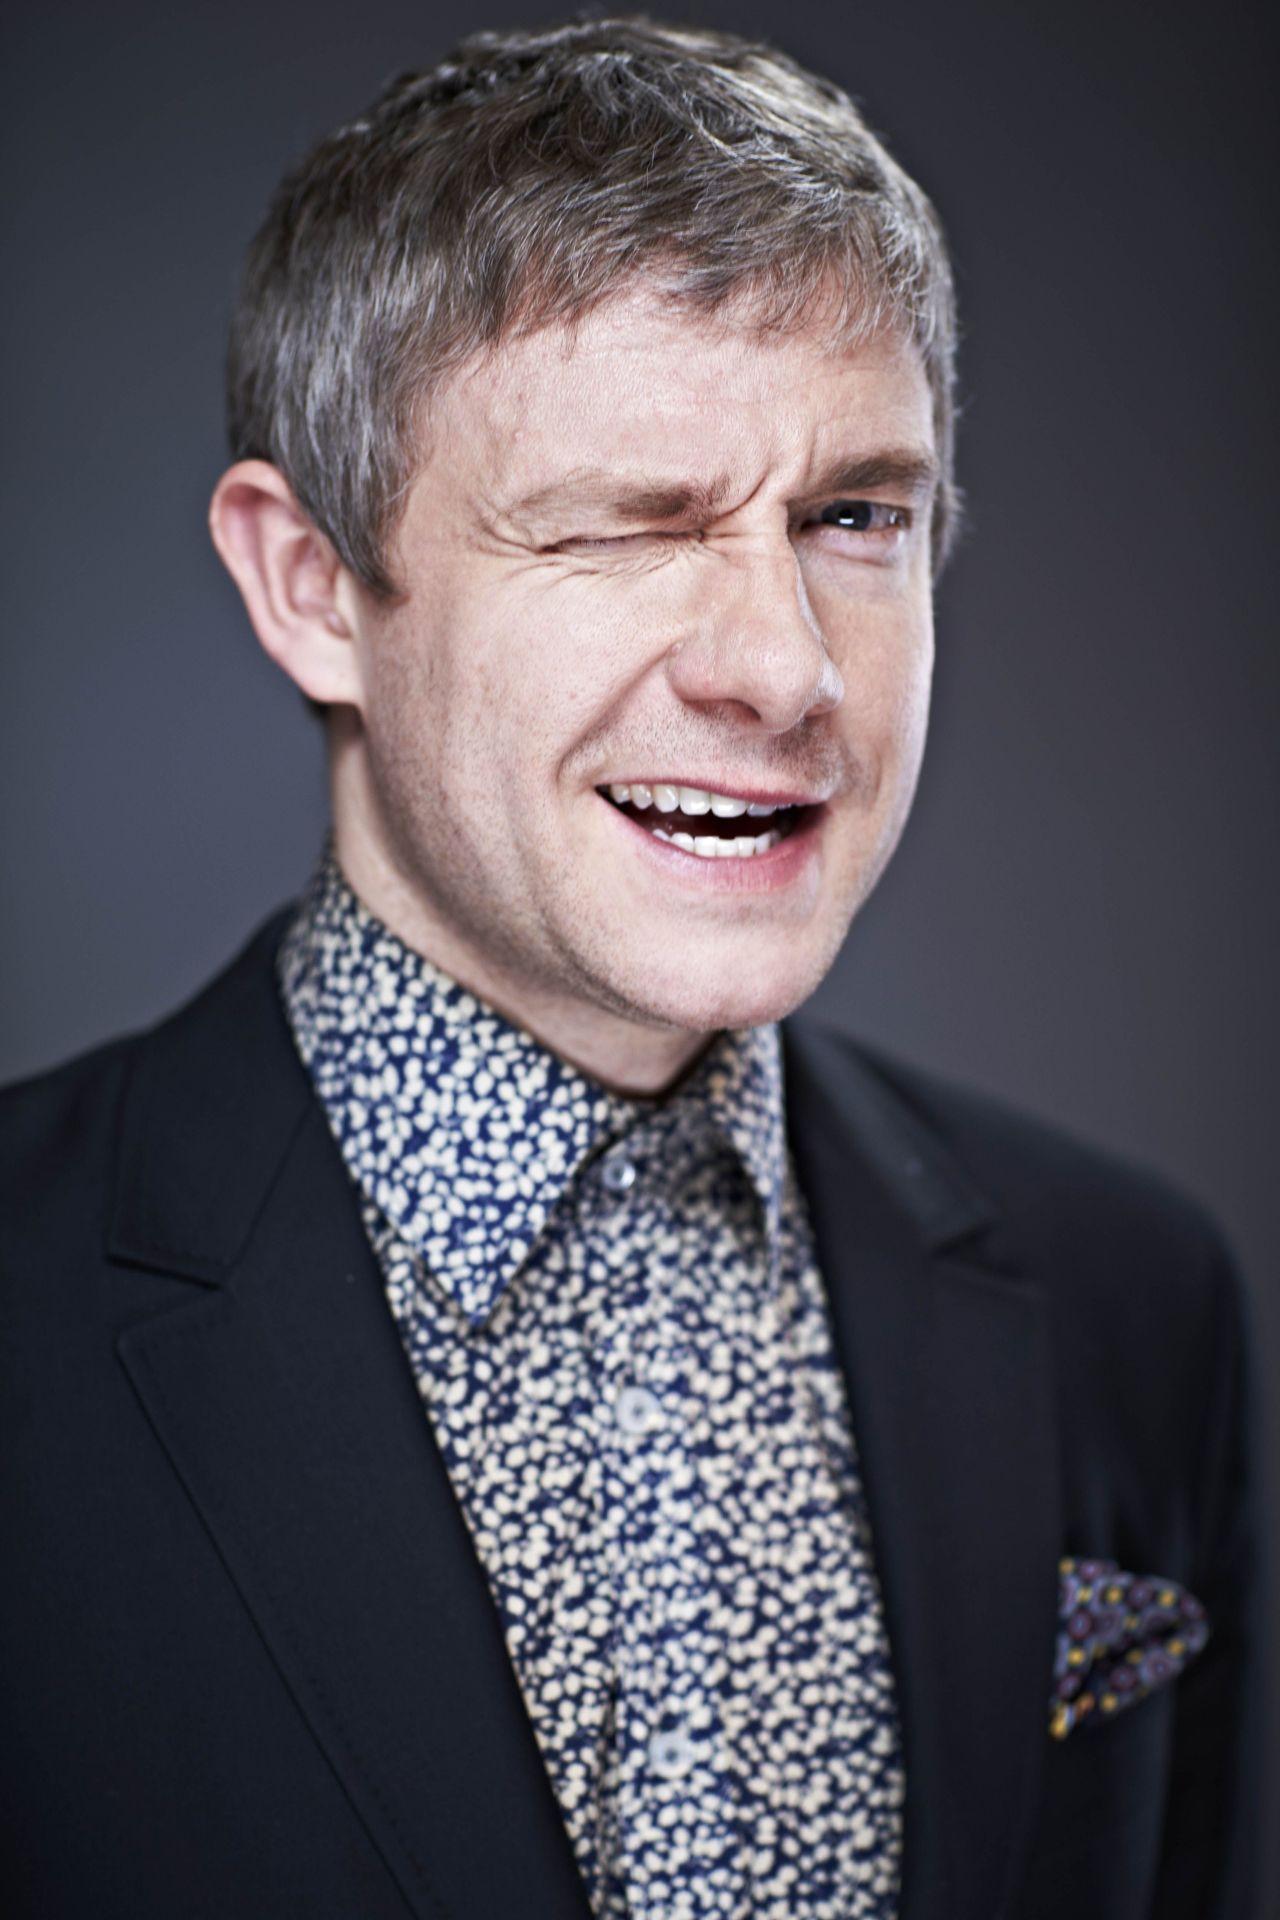 Sherlock Wallpaper Quotes Steven Moffat Martin Freeman Mark Gatiss Bbc Sherlock Cast